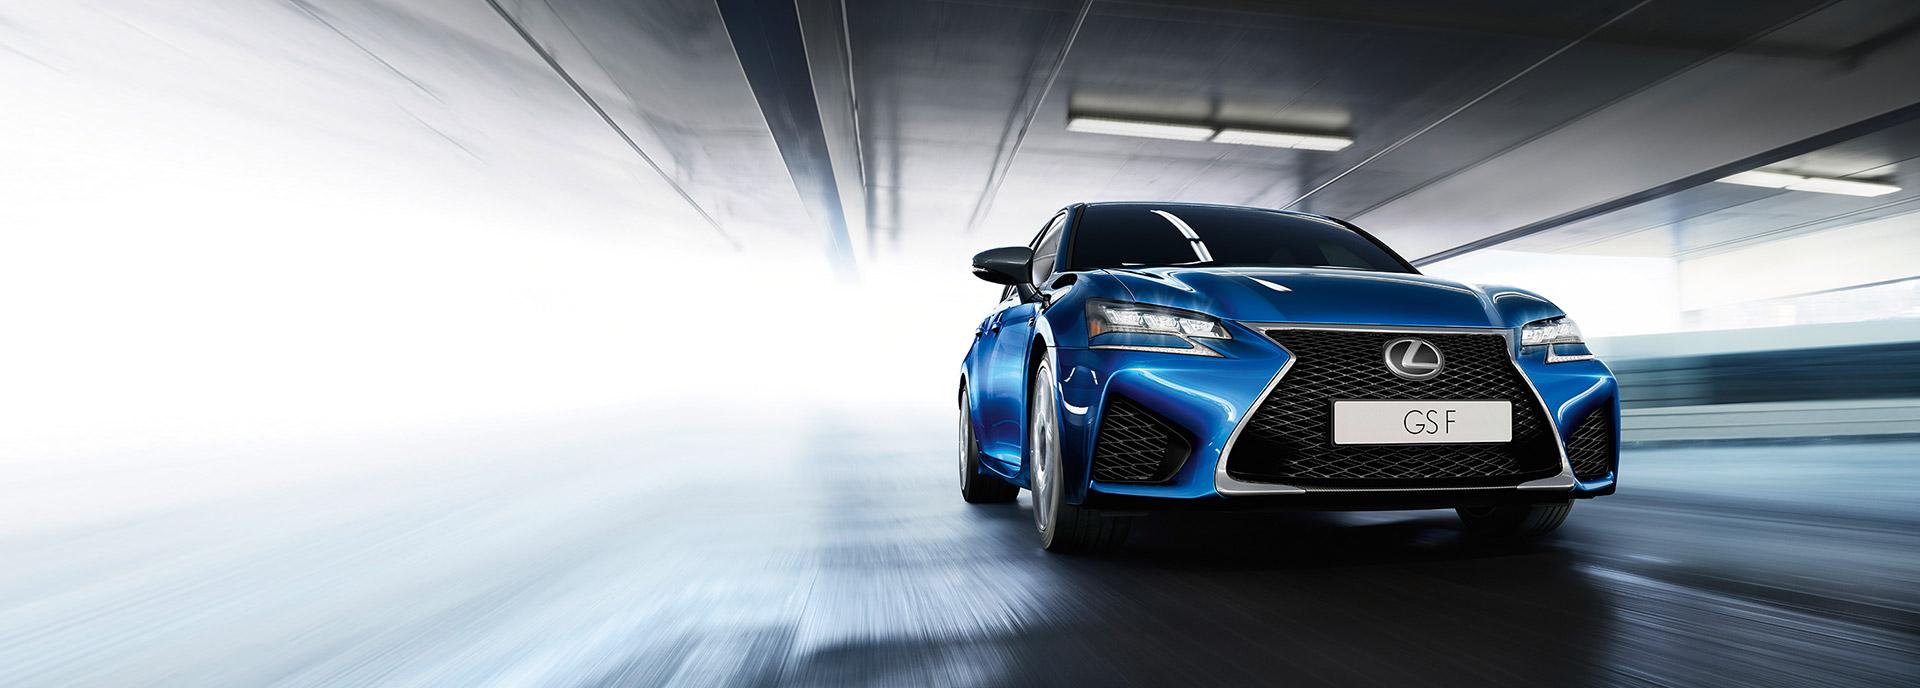 Lexus GS F hero